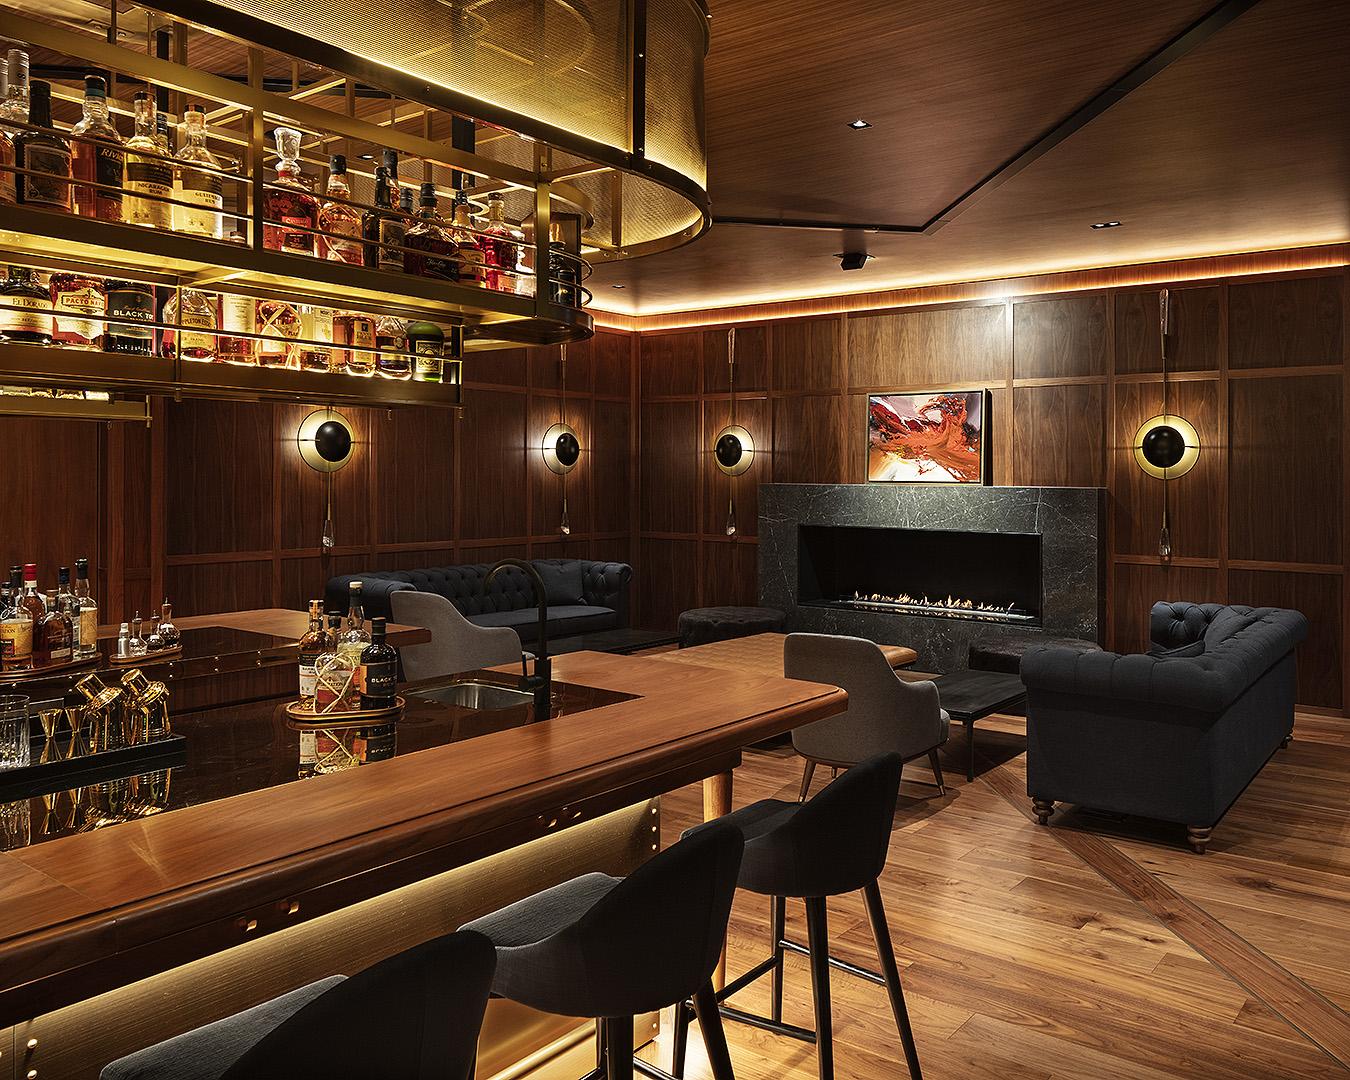 The stunning Captain's bar at the Park Hyatt hotel.